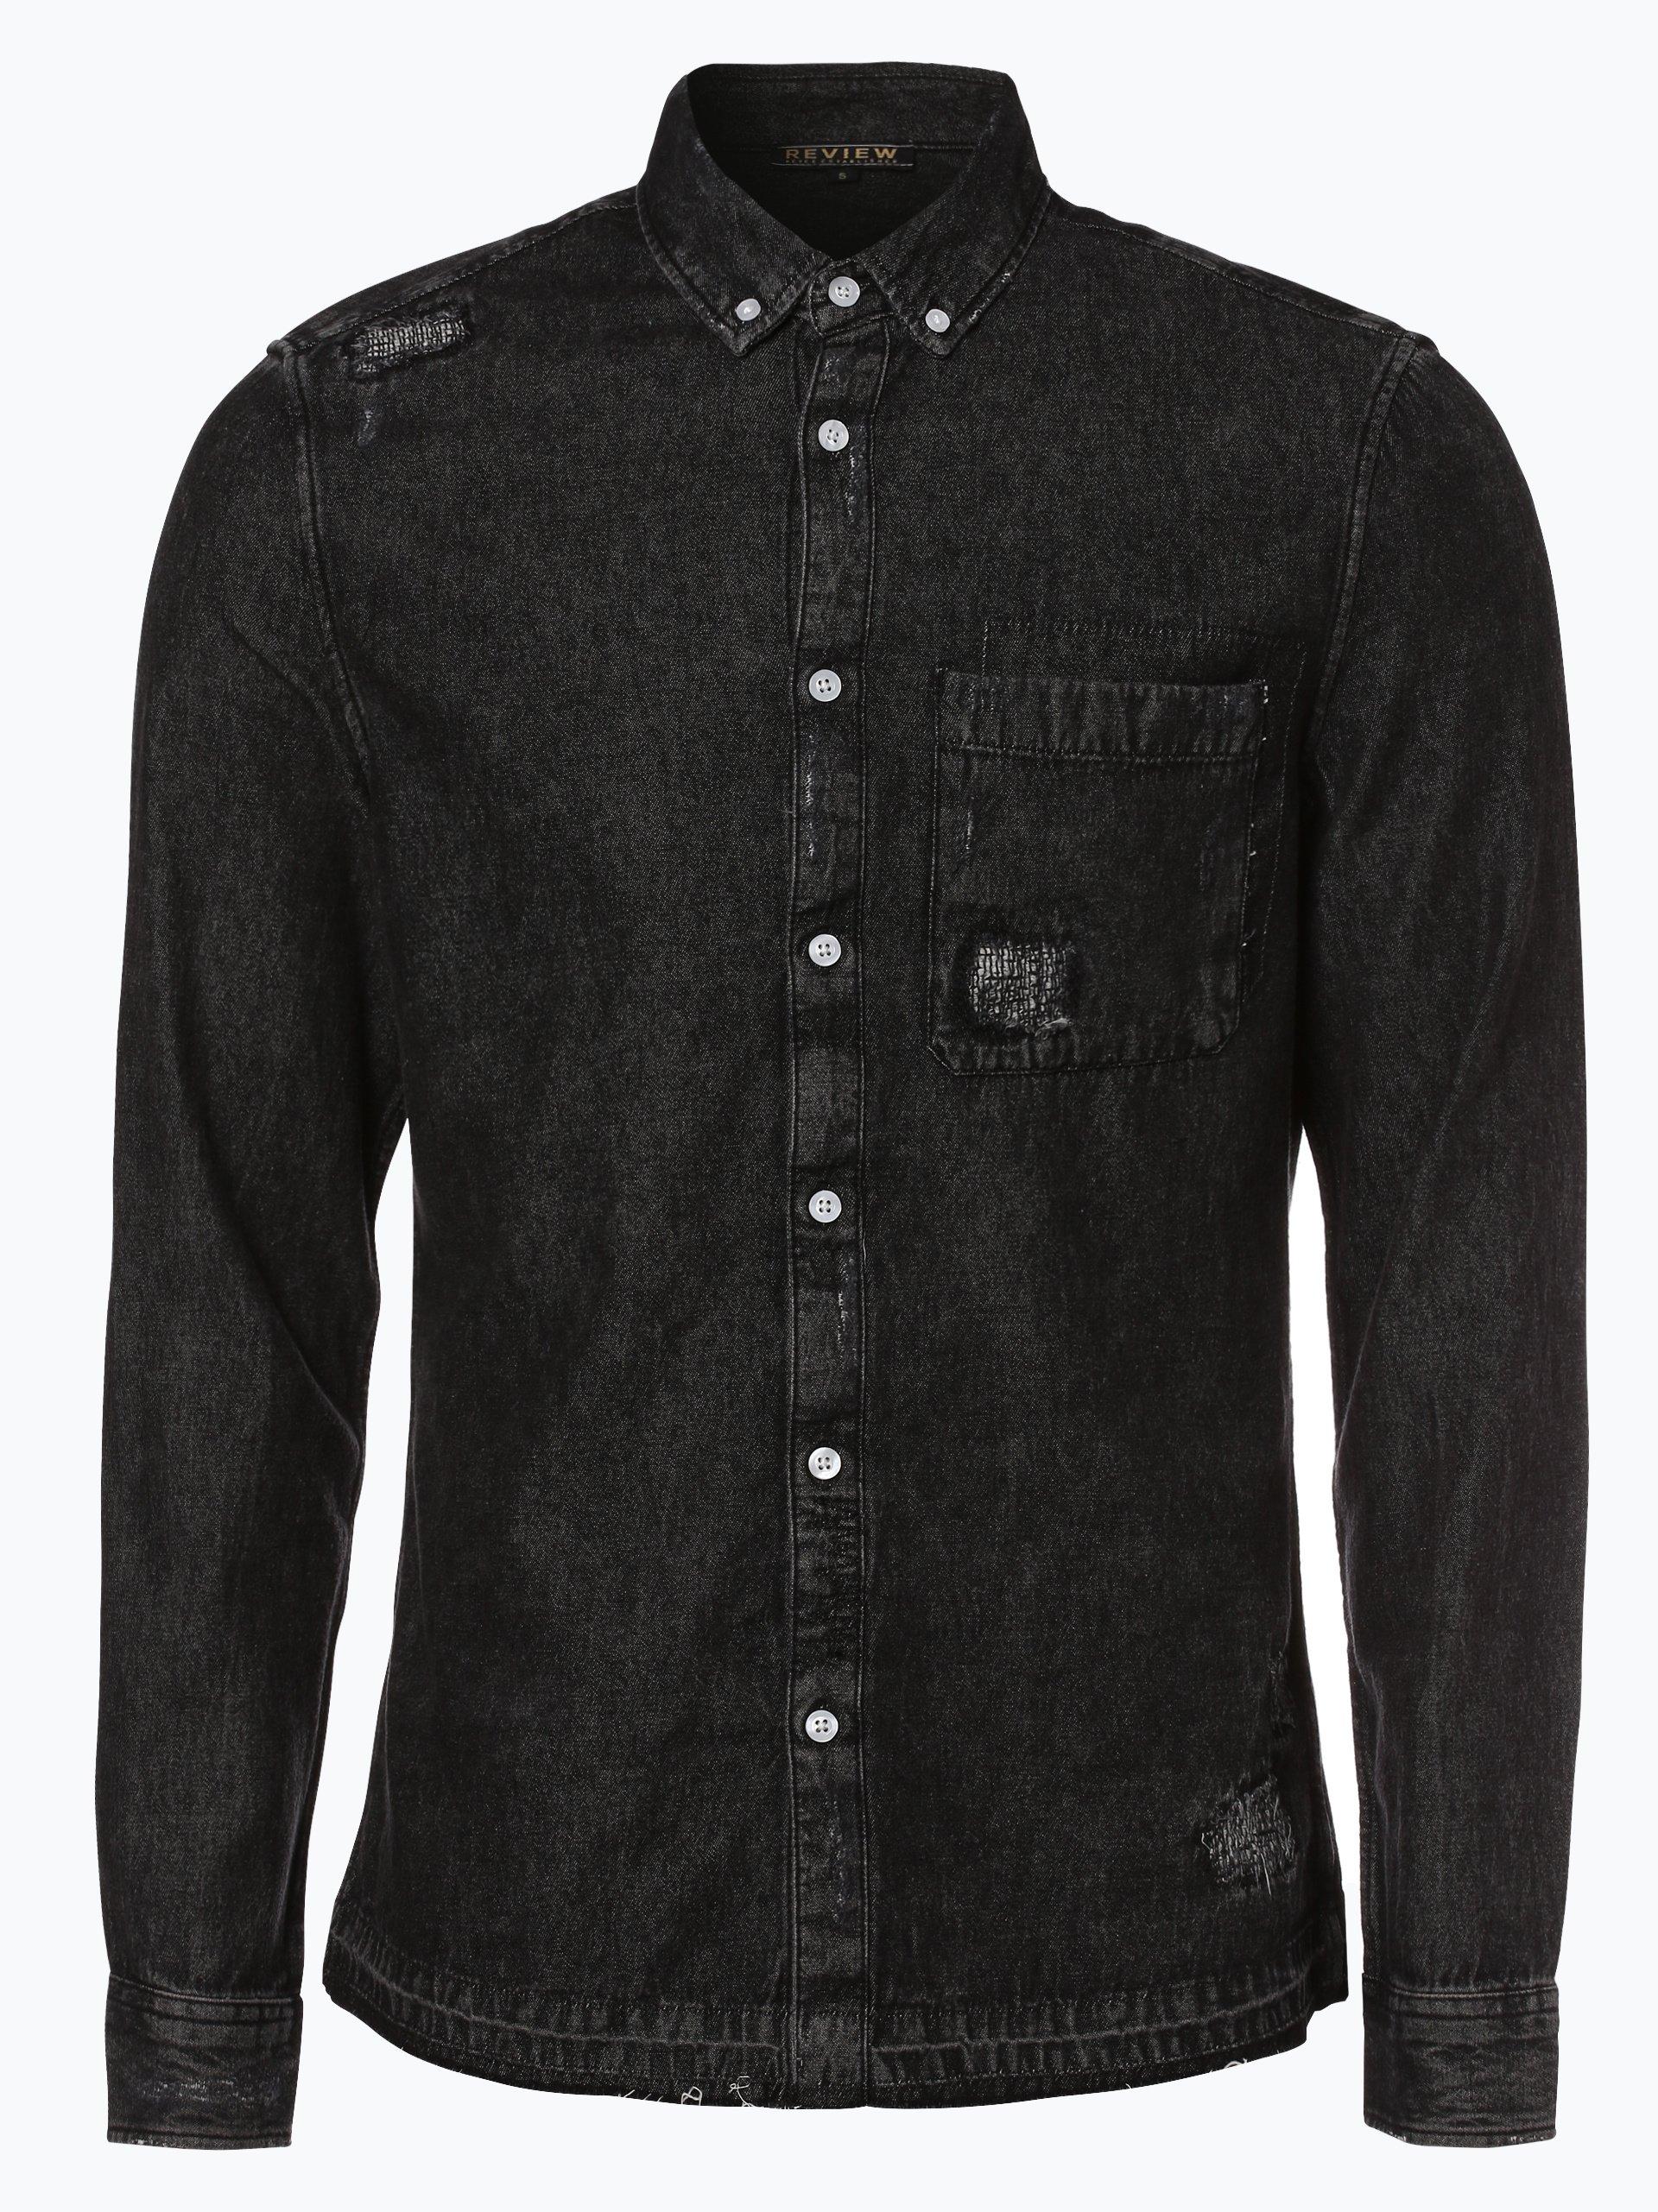 review herren jeanshemd schwarz uni online kaufen vangraaf com. Black Bedroom Furniture Sets. Home Design Ideas